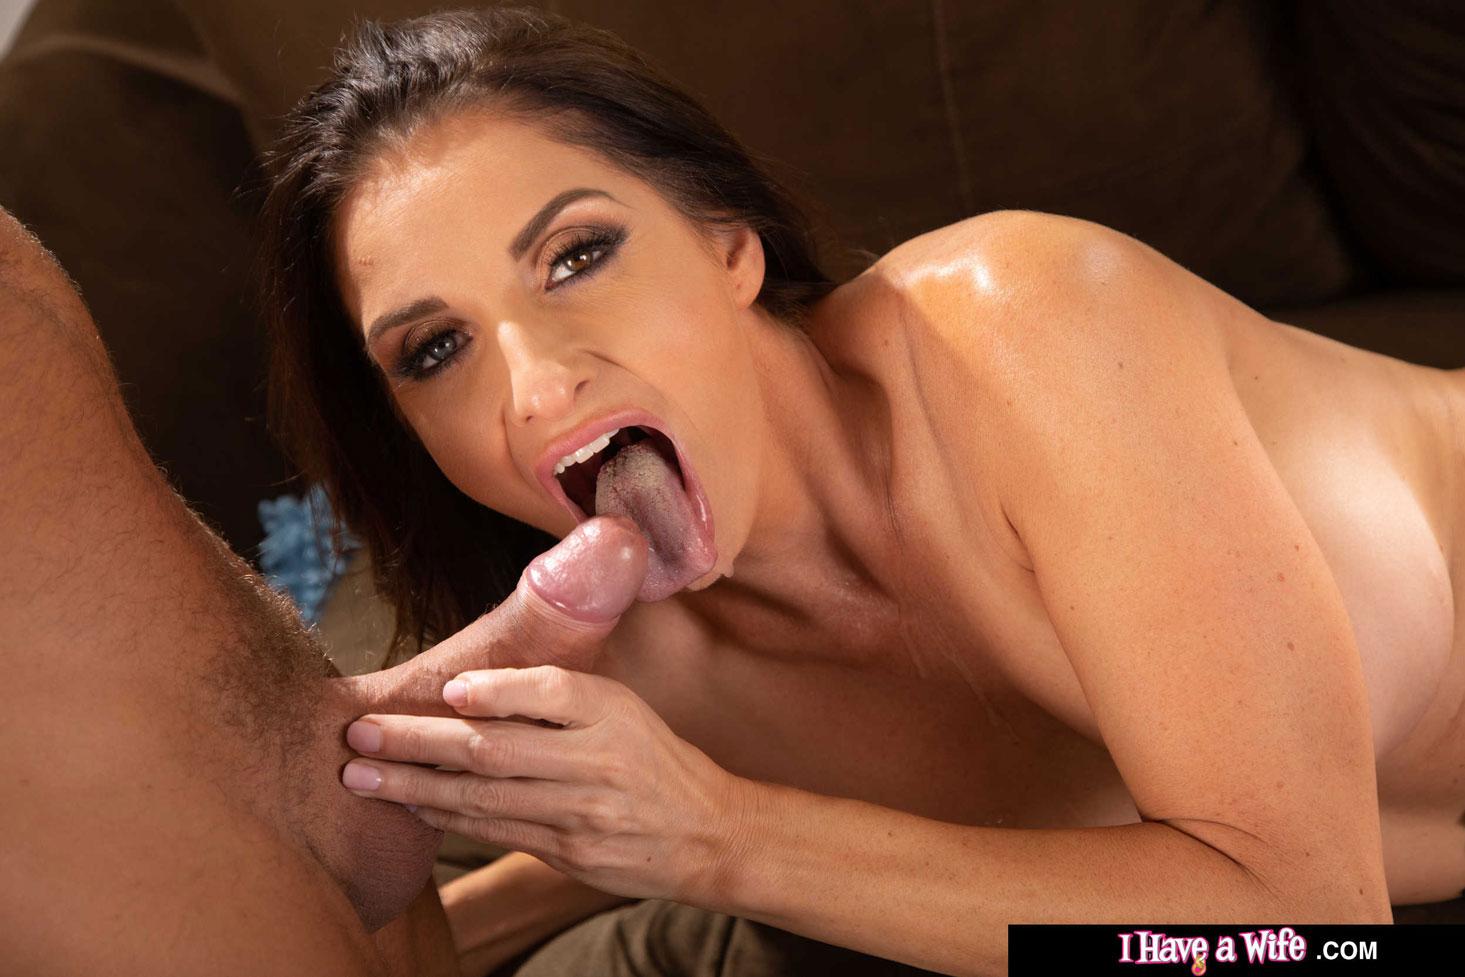 Naughty America - Silvia Saige Maid Fucks her Boss 12